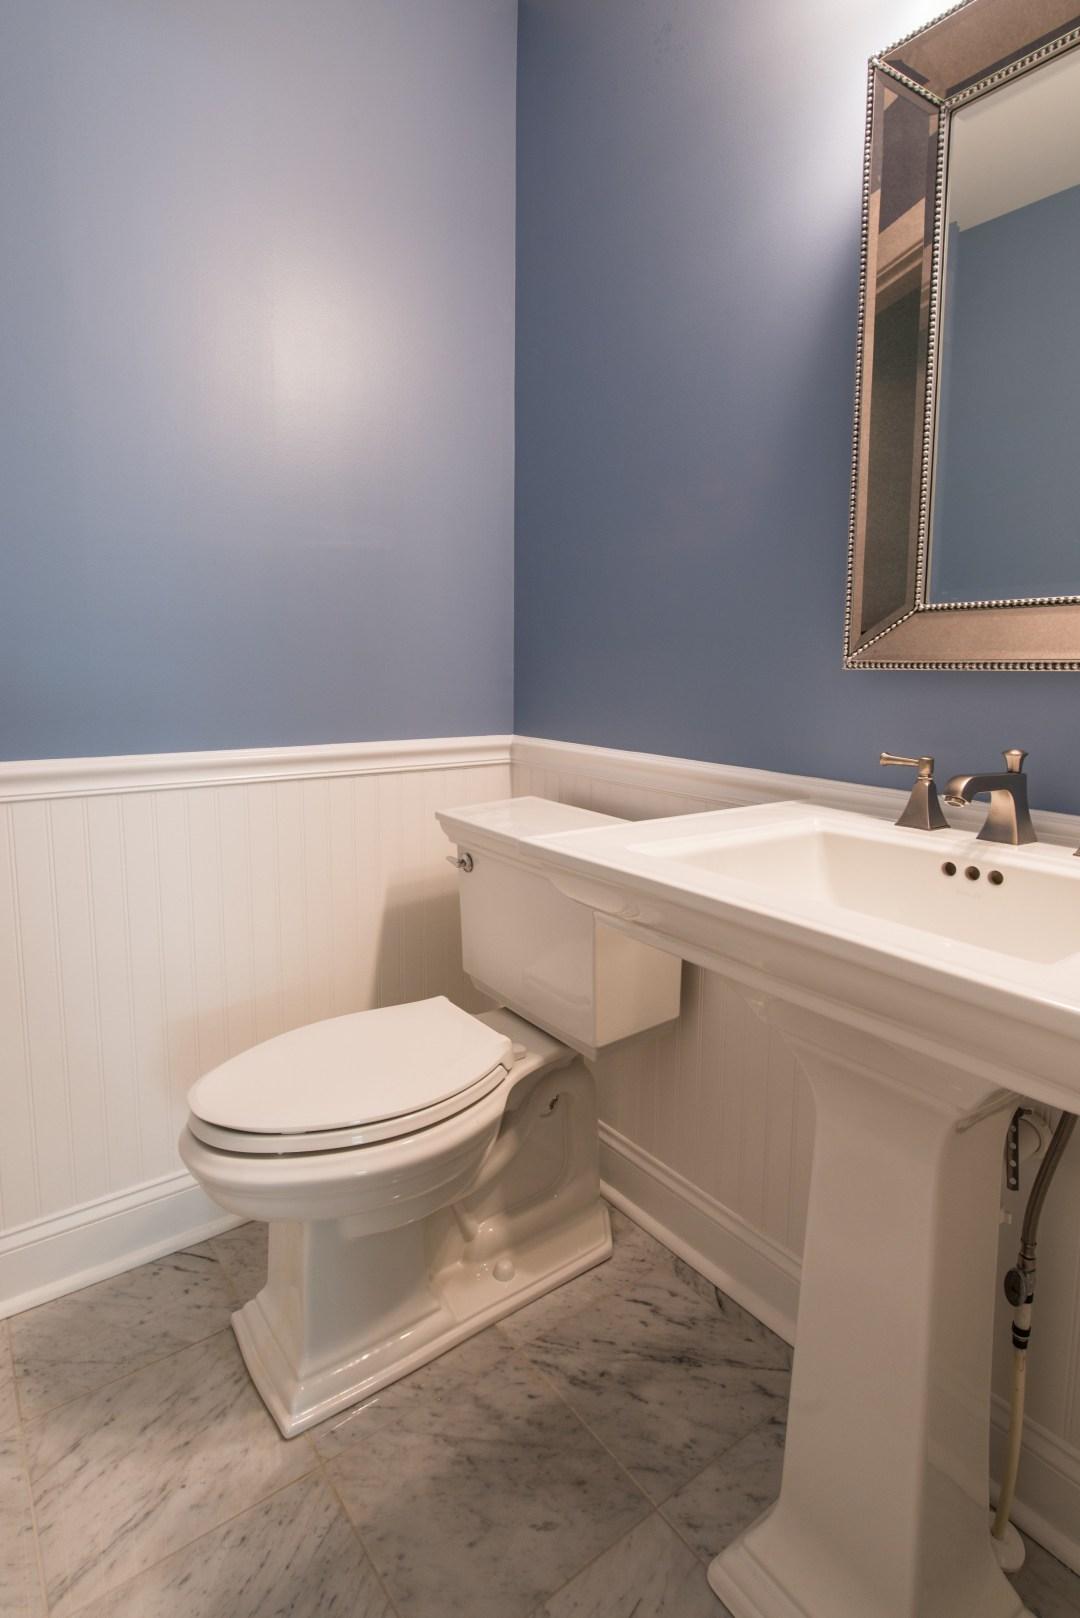 Bathroom Remodel in Ocean Ridge, Bethany Beach DE with Memoirs Pedestal Sink, Elongated Toilet and Framed Mirror